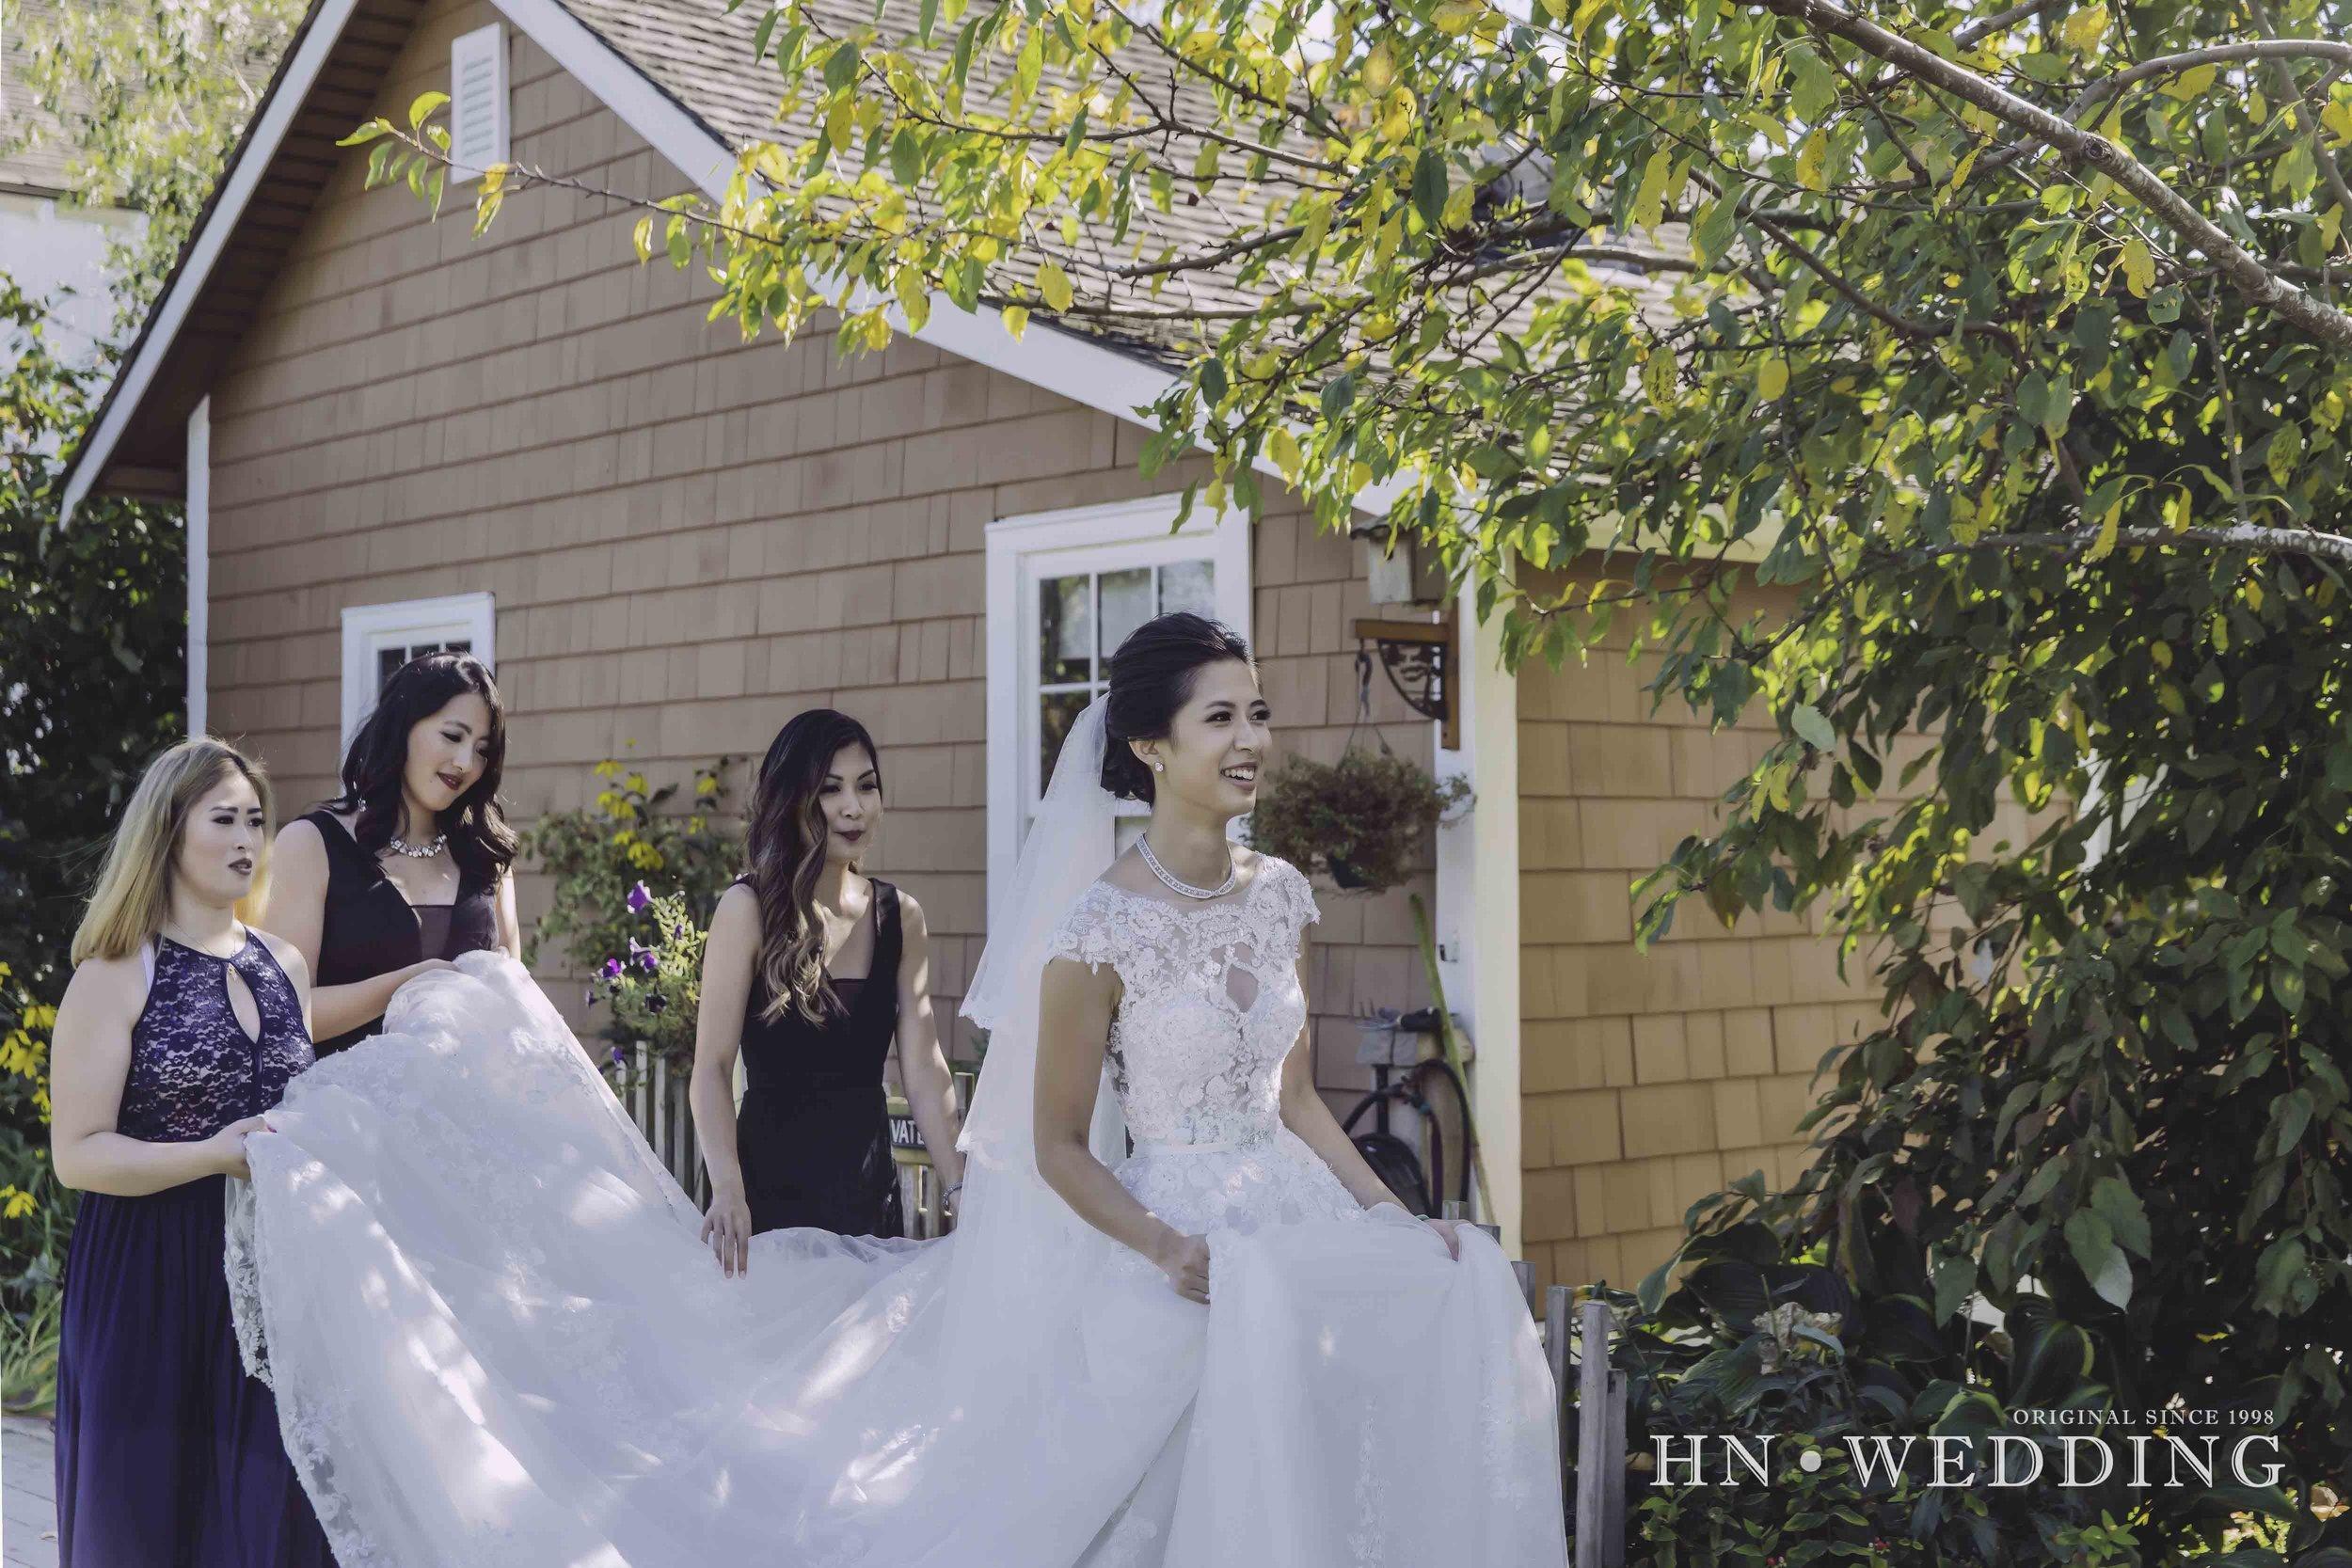 HNwedding-20160815-wedding-014.jpg